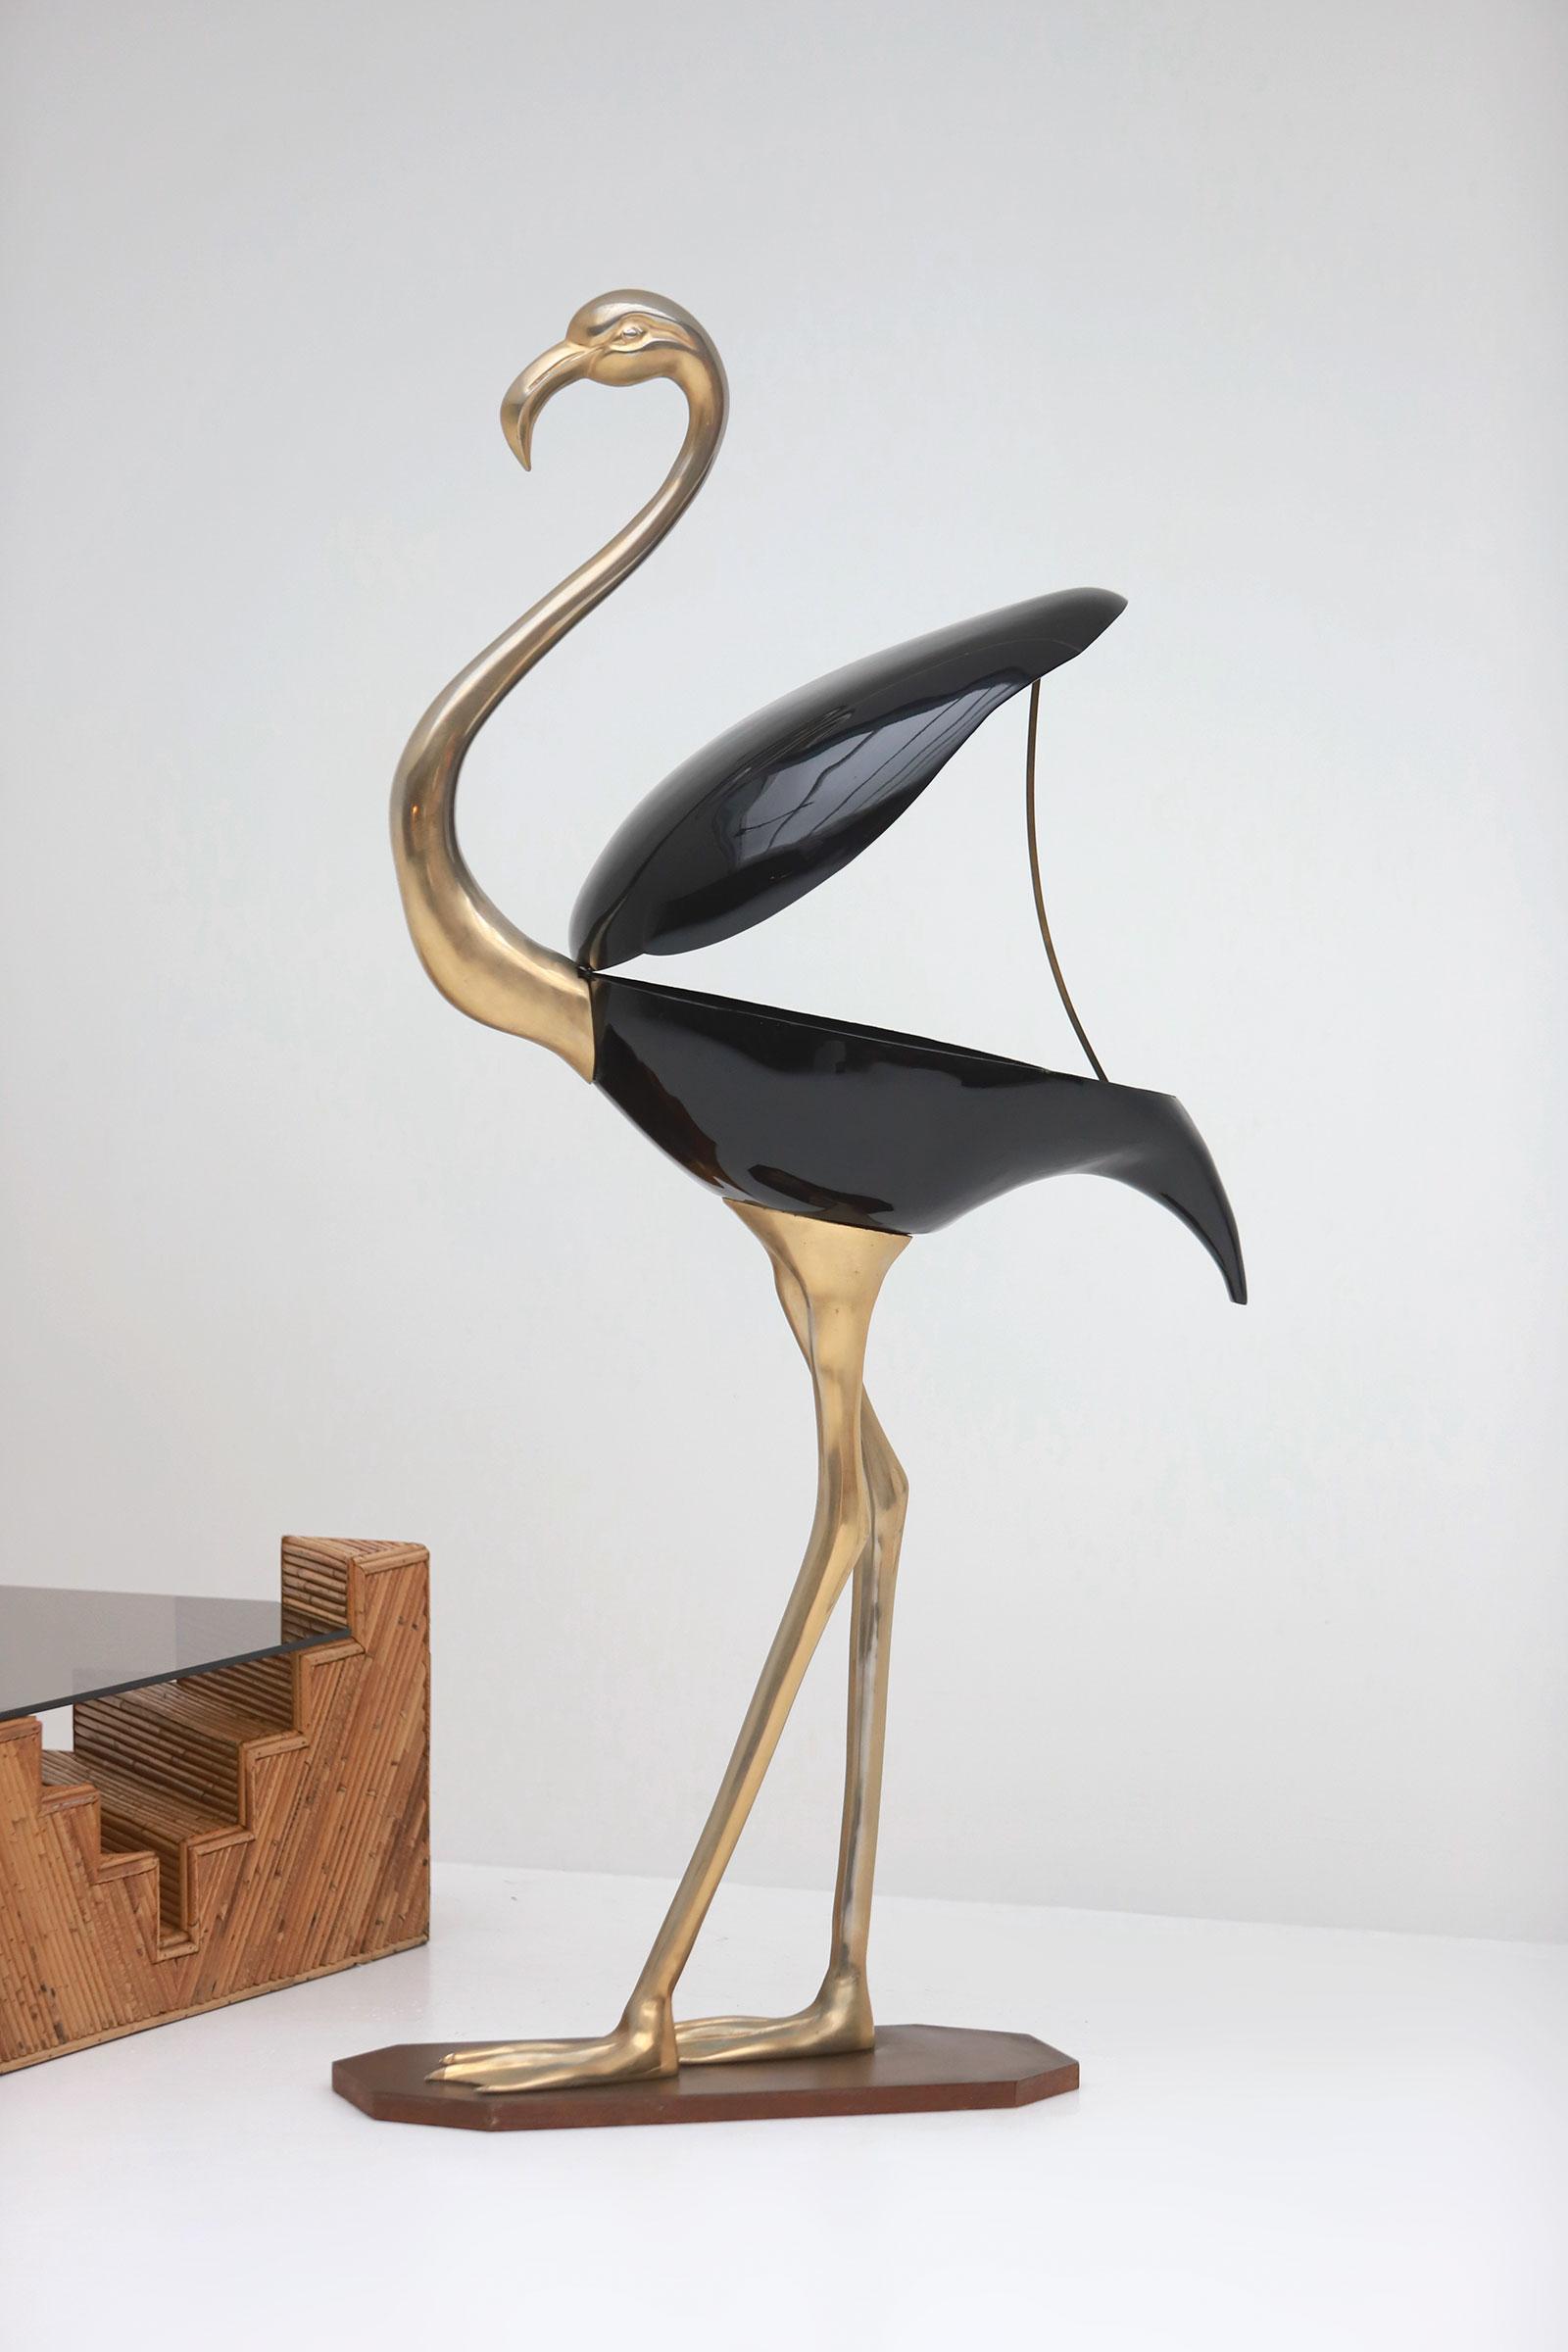 Fondica Lifesize Brass Flamingo 1970simage 5